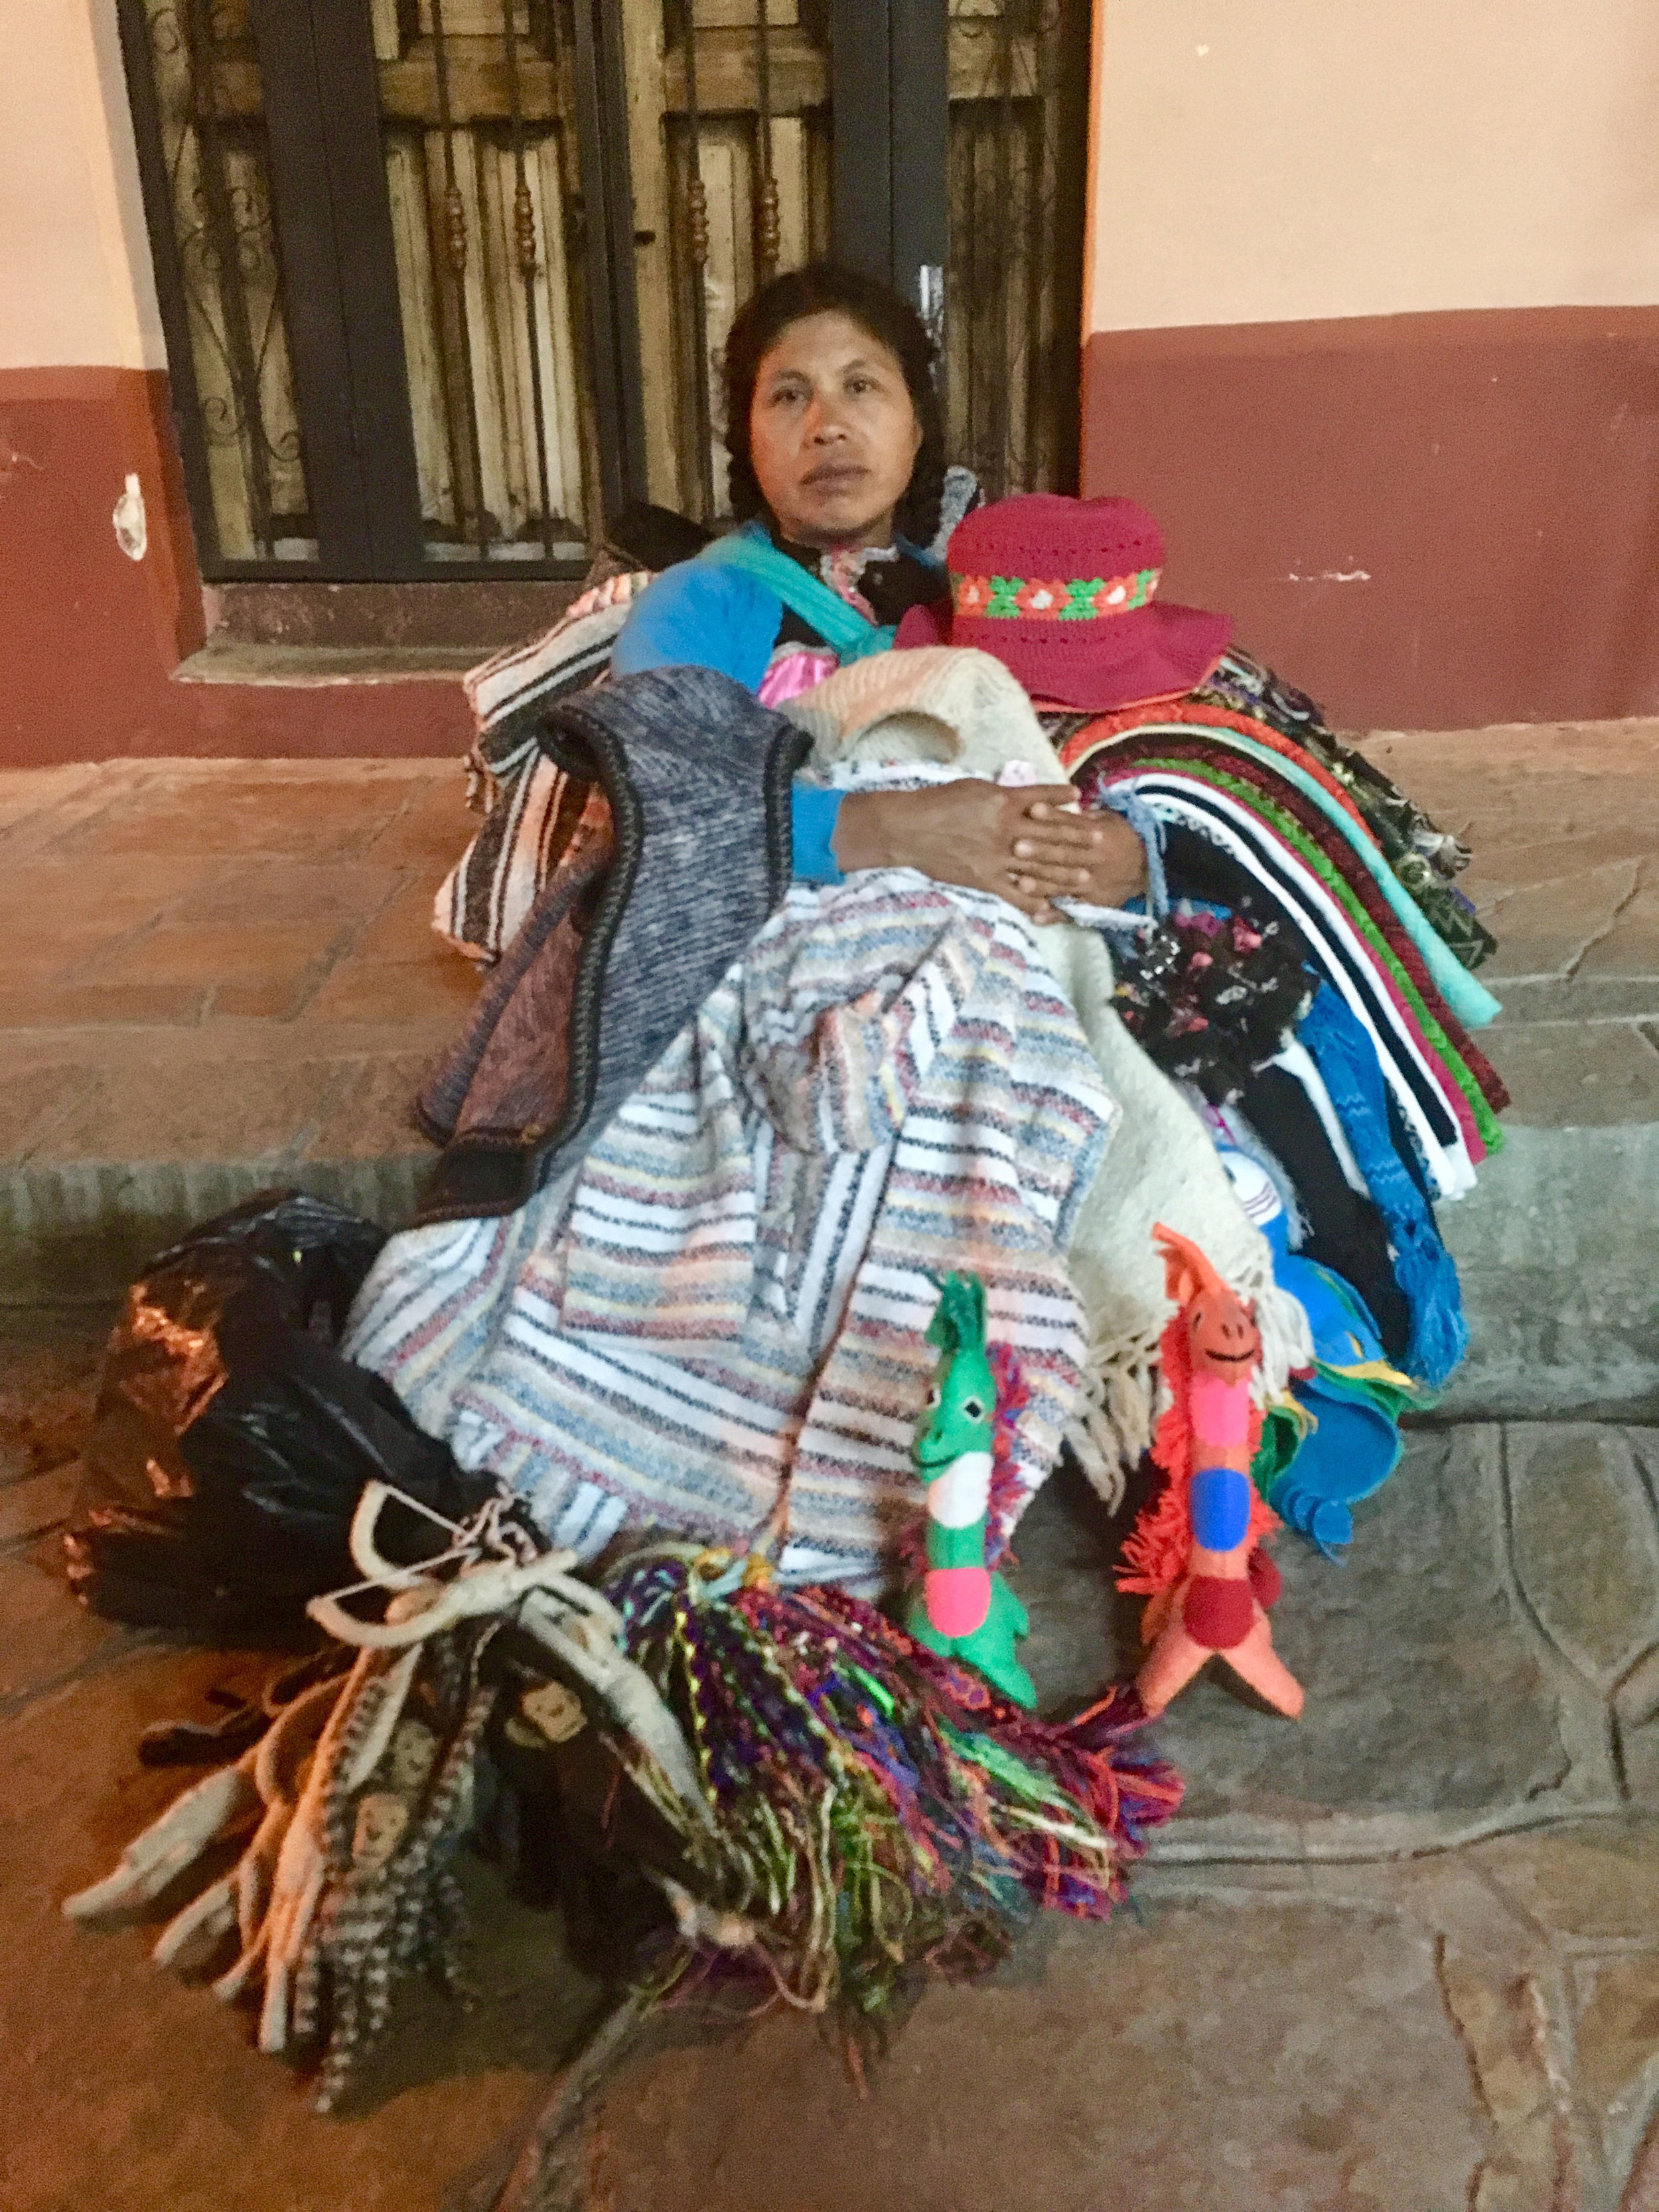 Tzotzil street vendor of textiles in San Cristóbal.